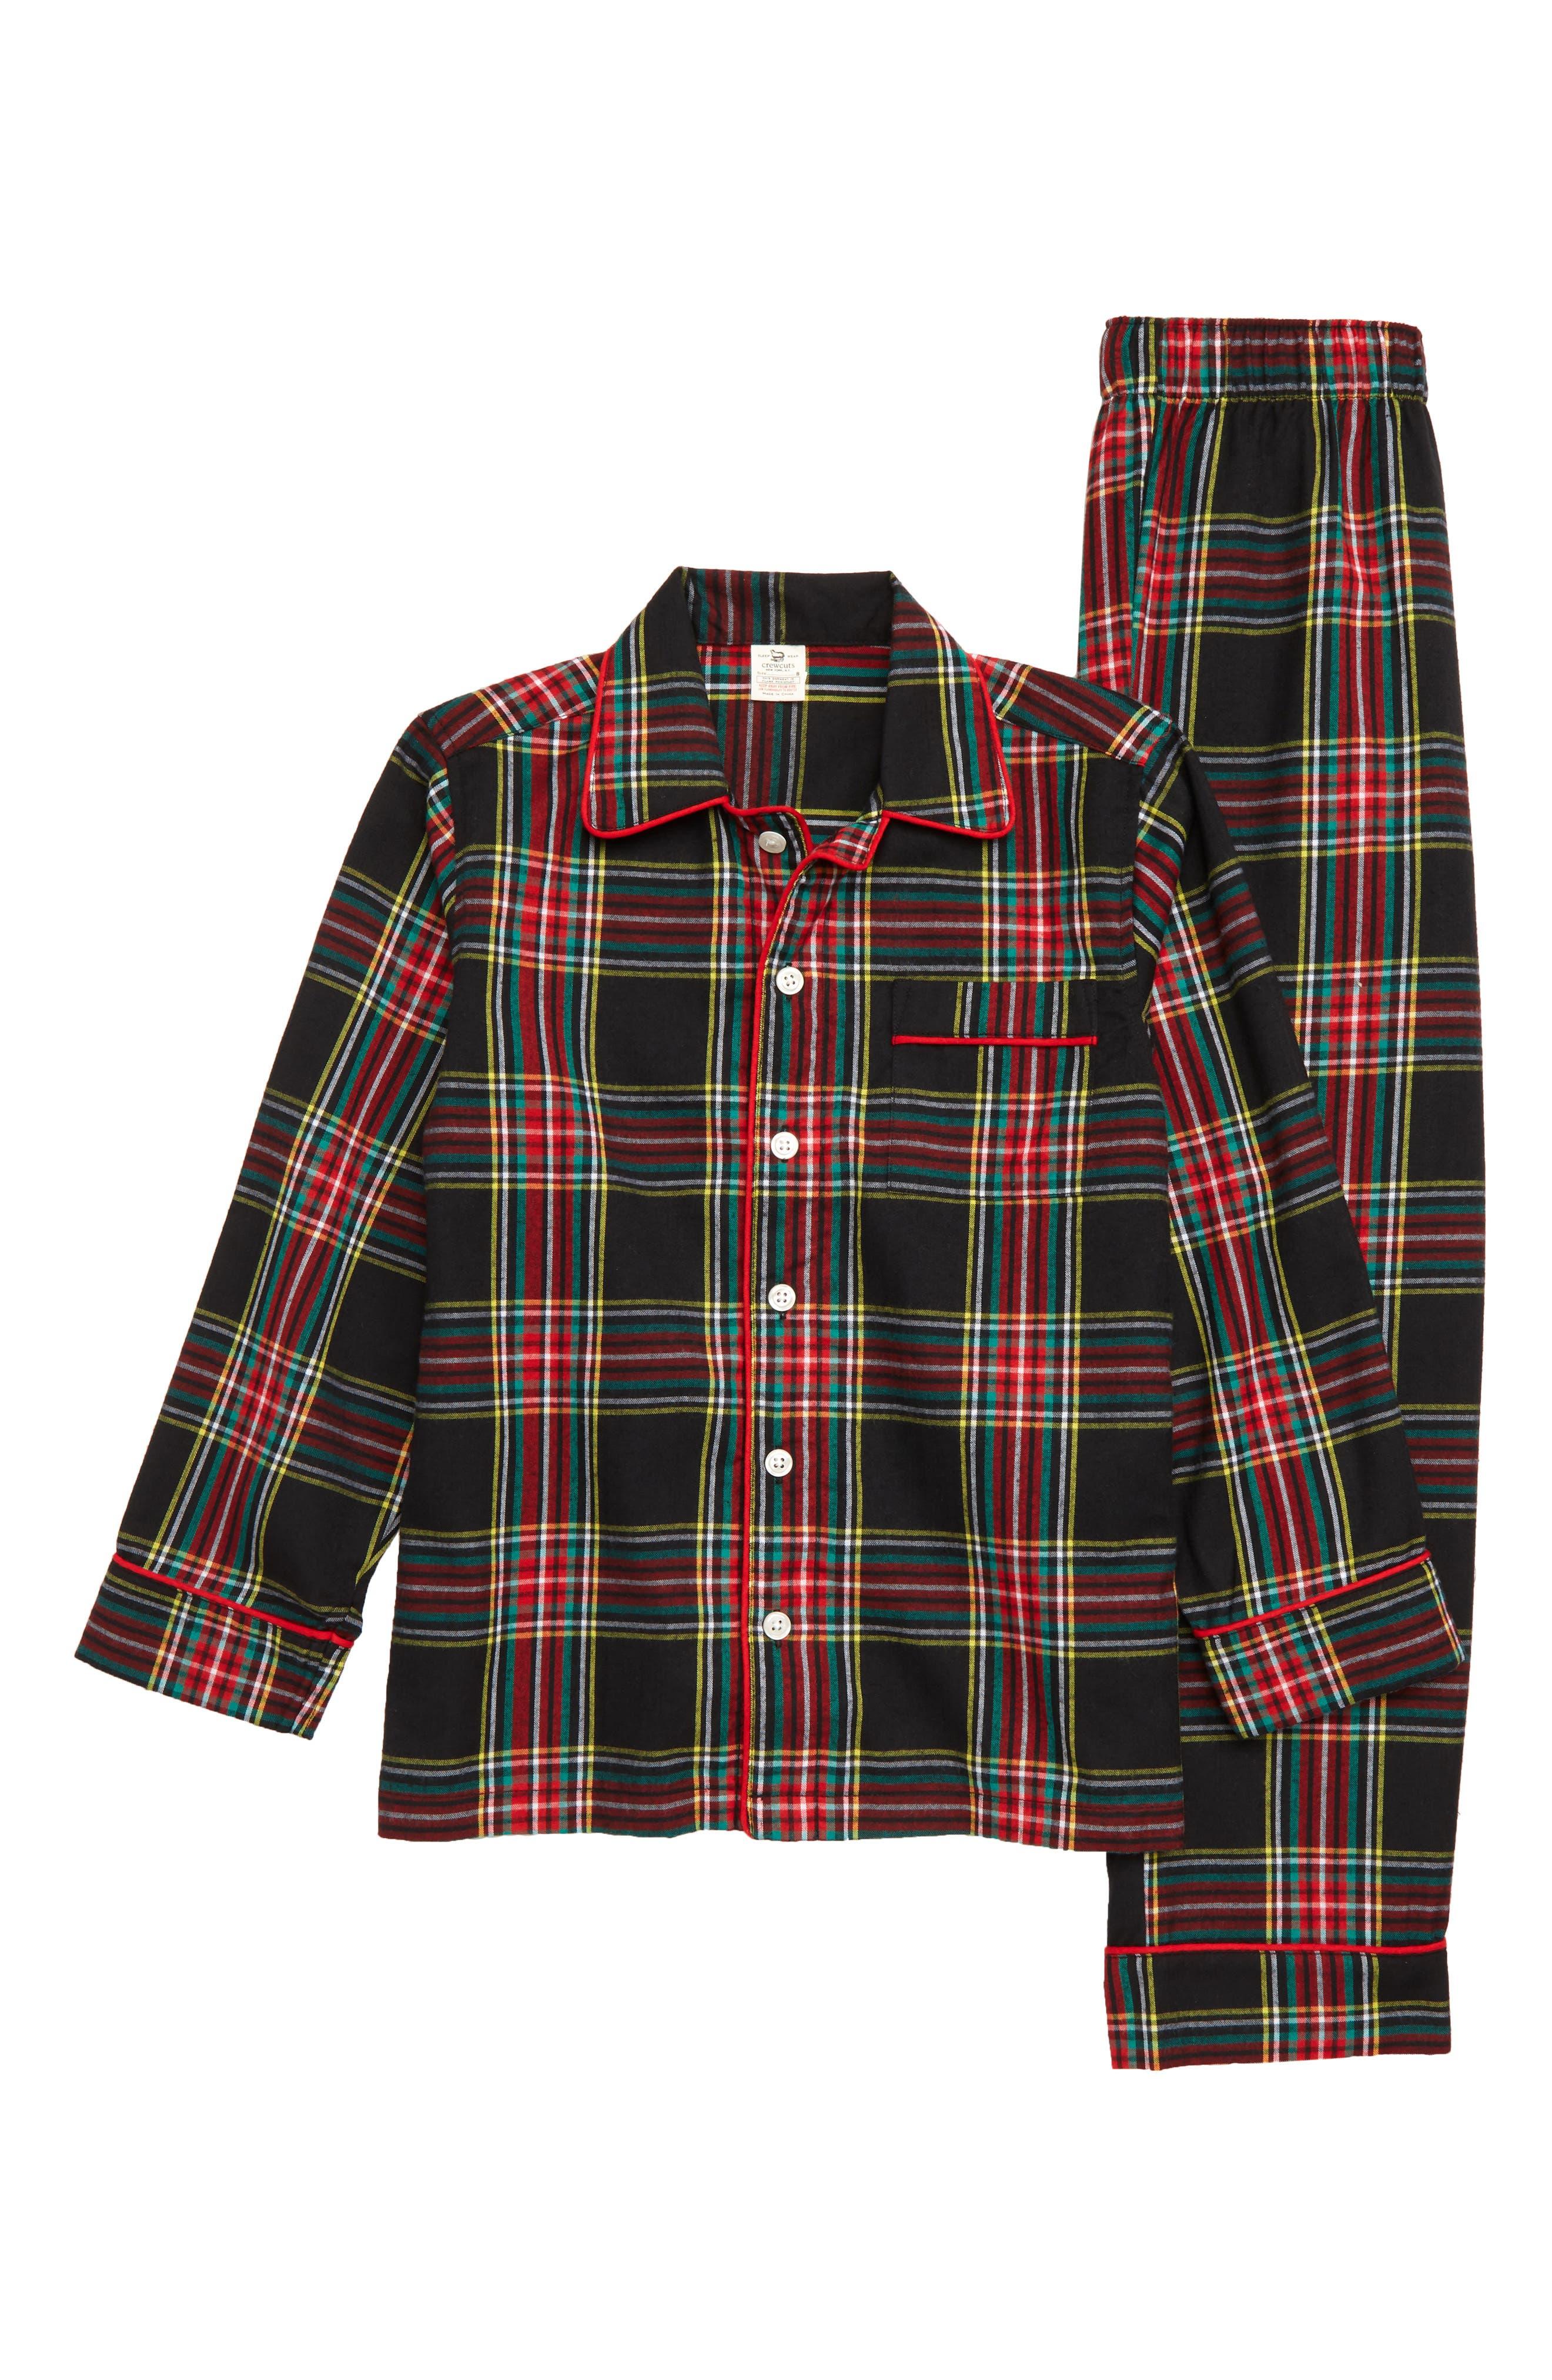 Toddler Boys Crewcuts By Jcrew Stewart Black Tartan TwoPiece Pajamas Size 2T  None